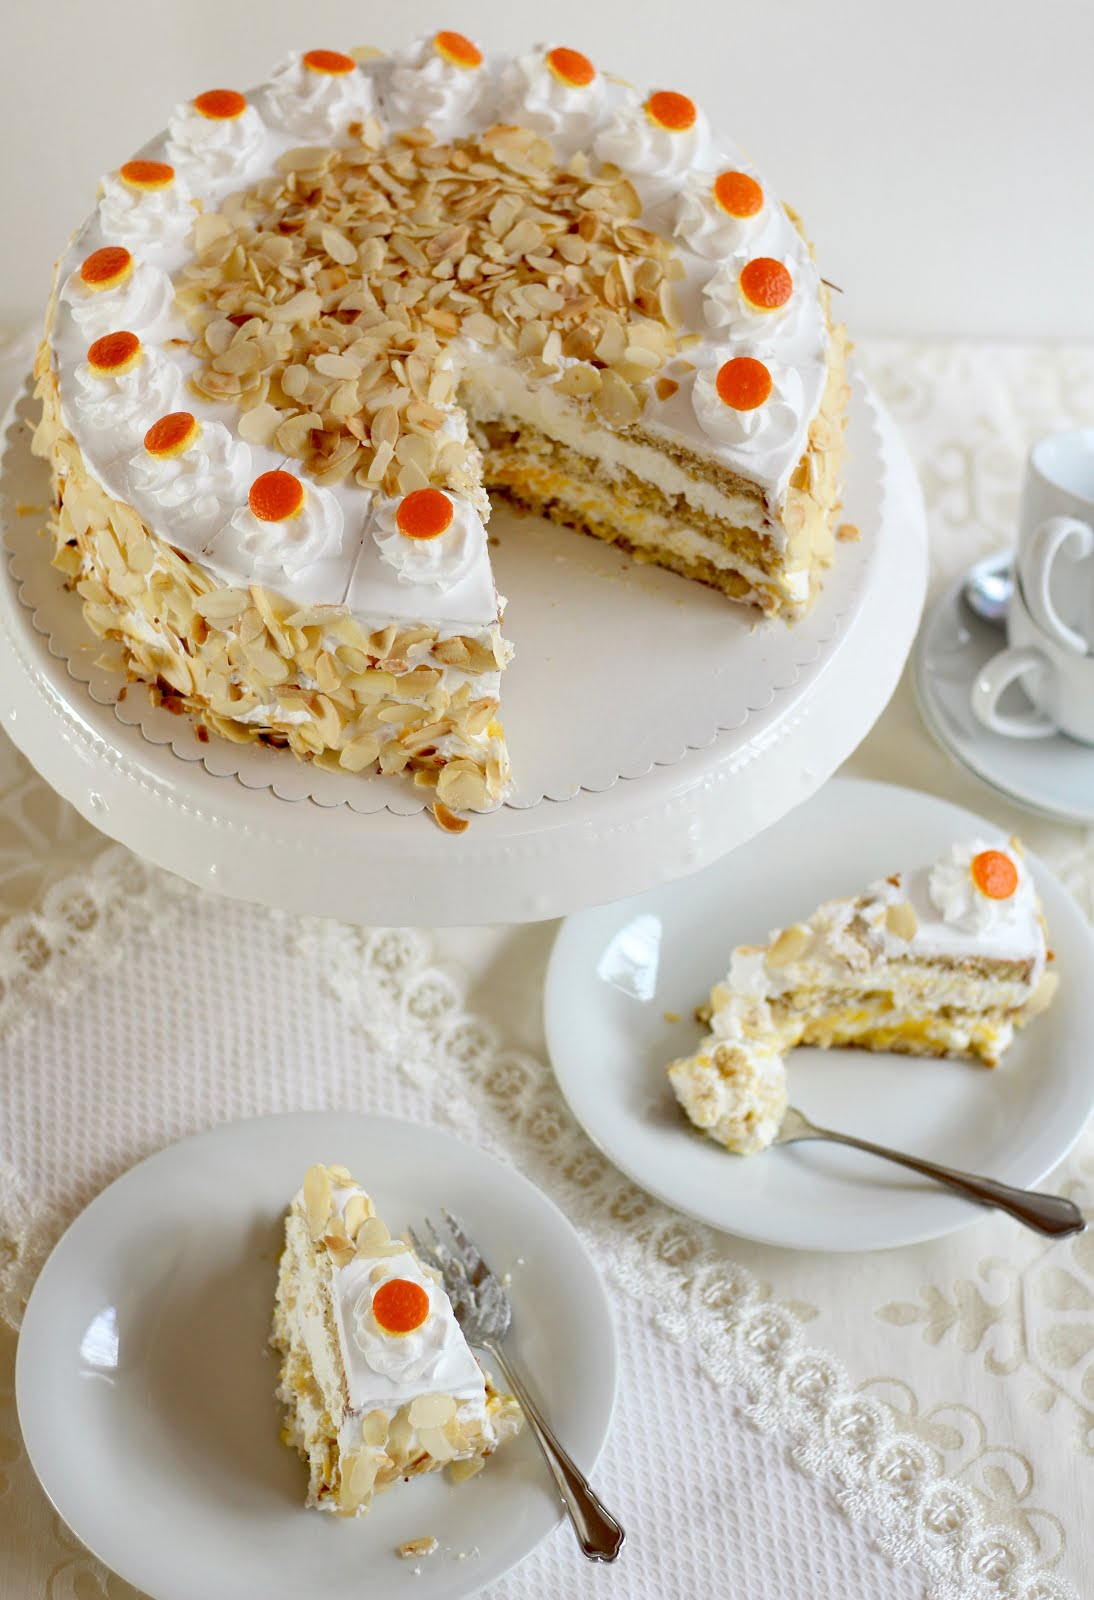 Saftige Orangen-Mandelbiskuit-Torte - Winterzauber-Torte - Rezept und Video